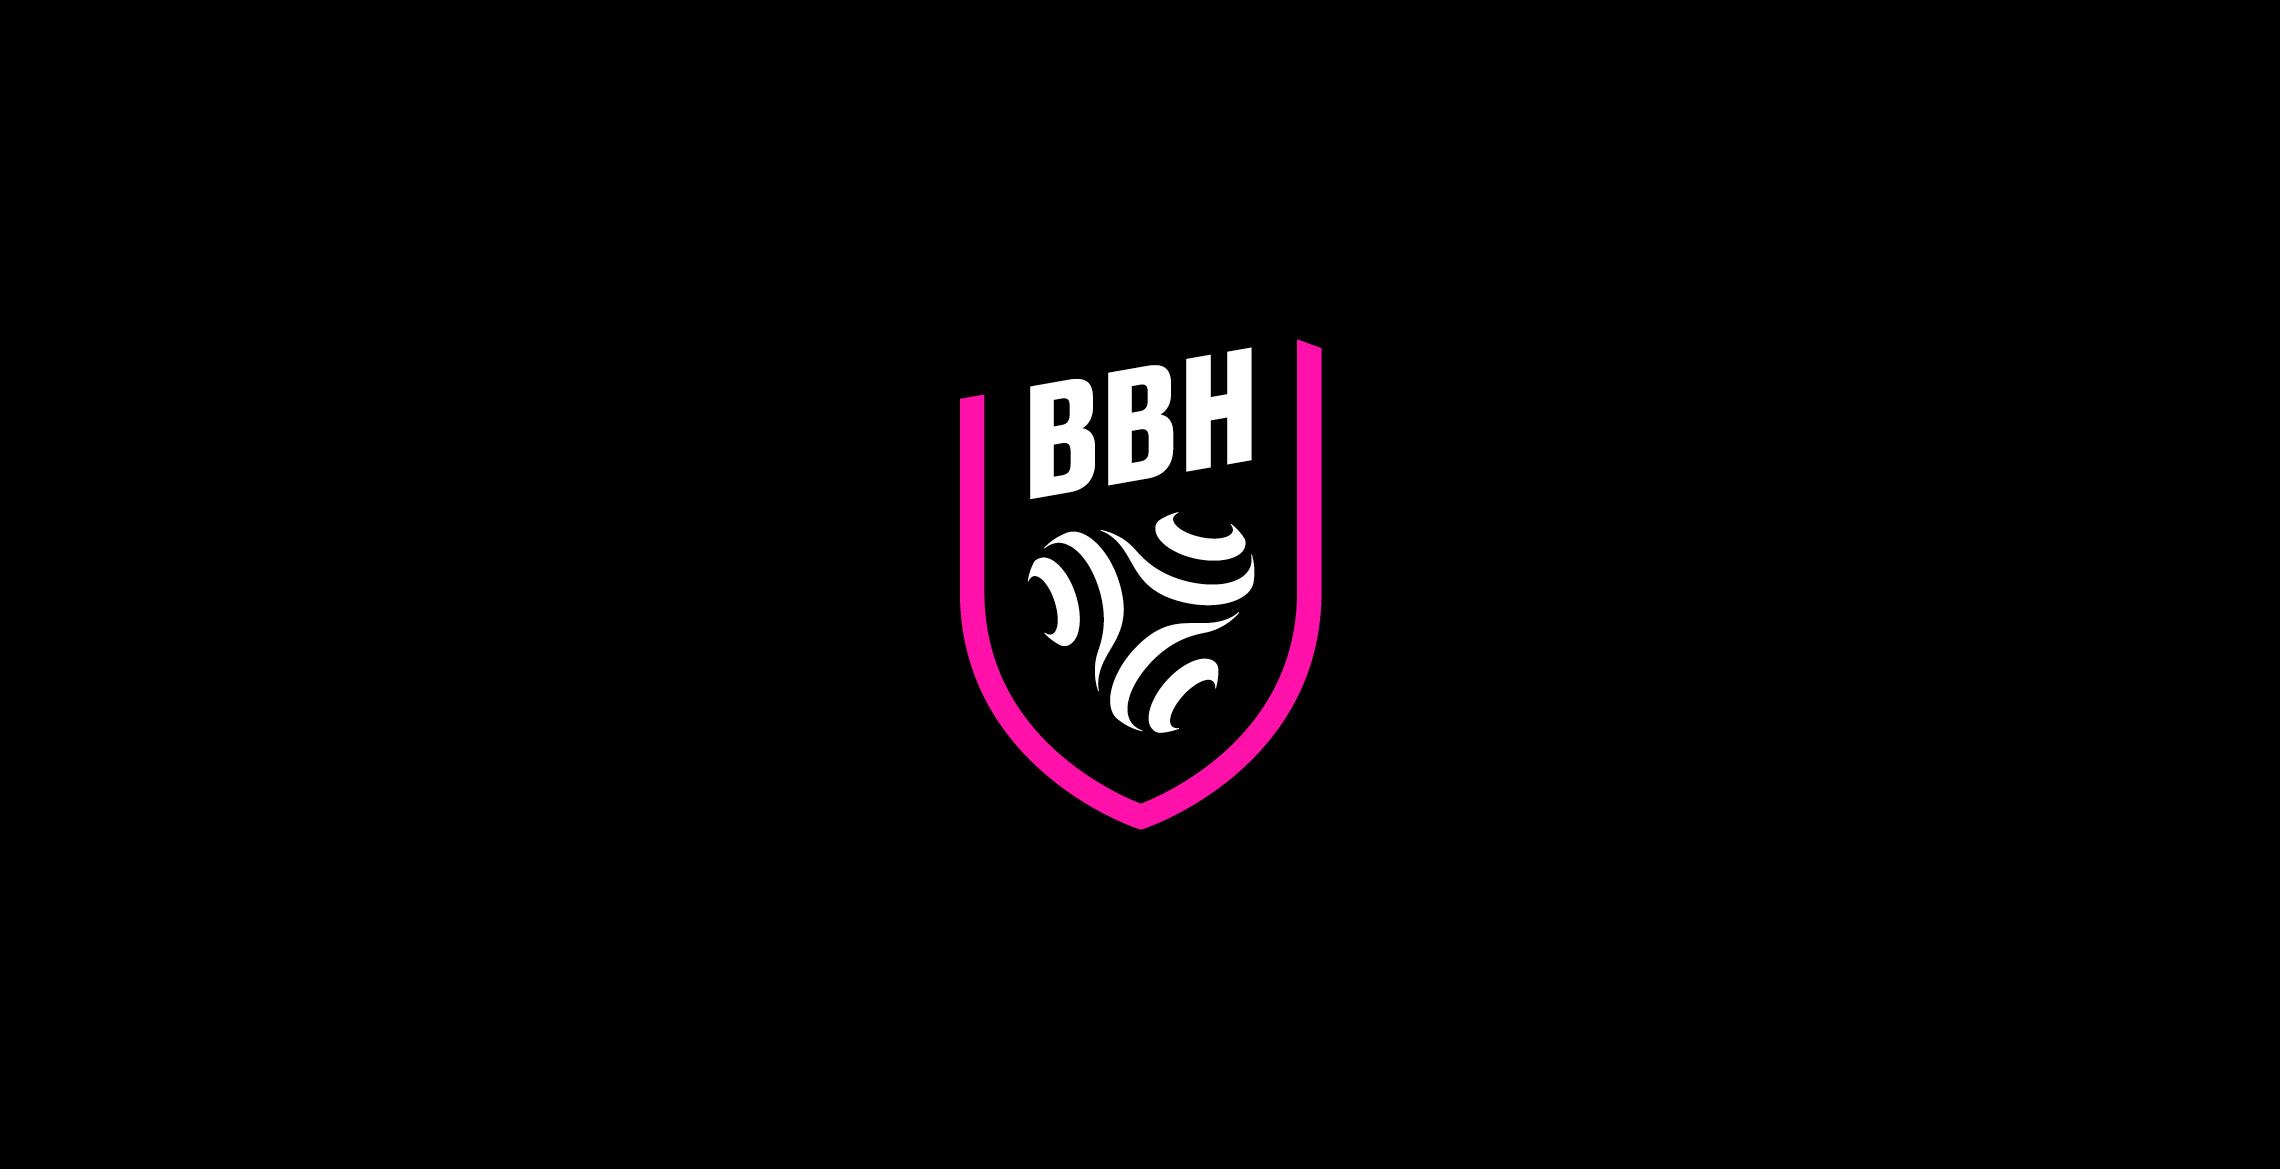 Club handball Brest BBH Branding communication